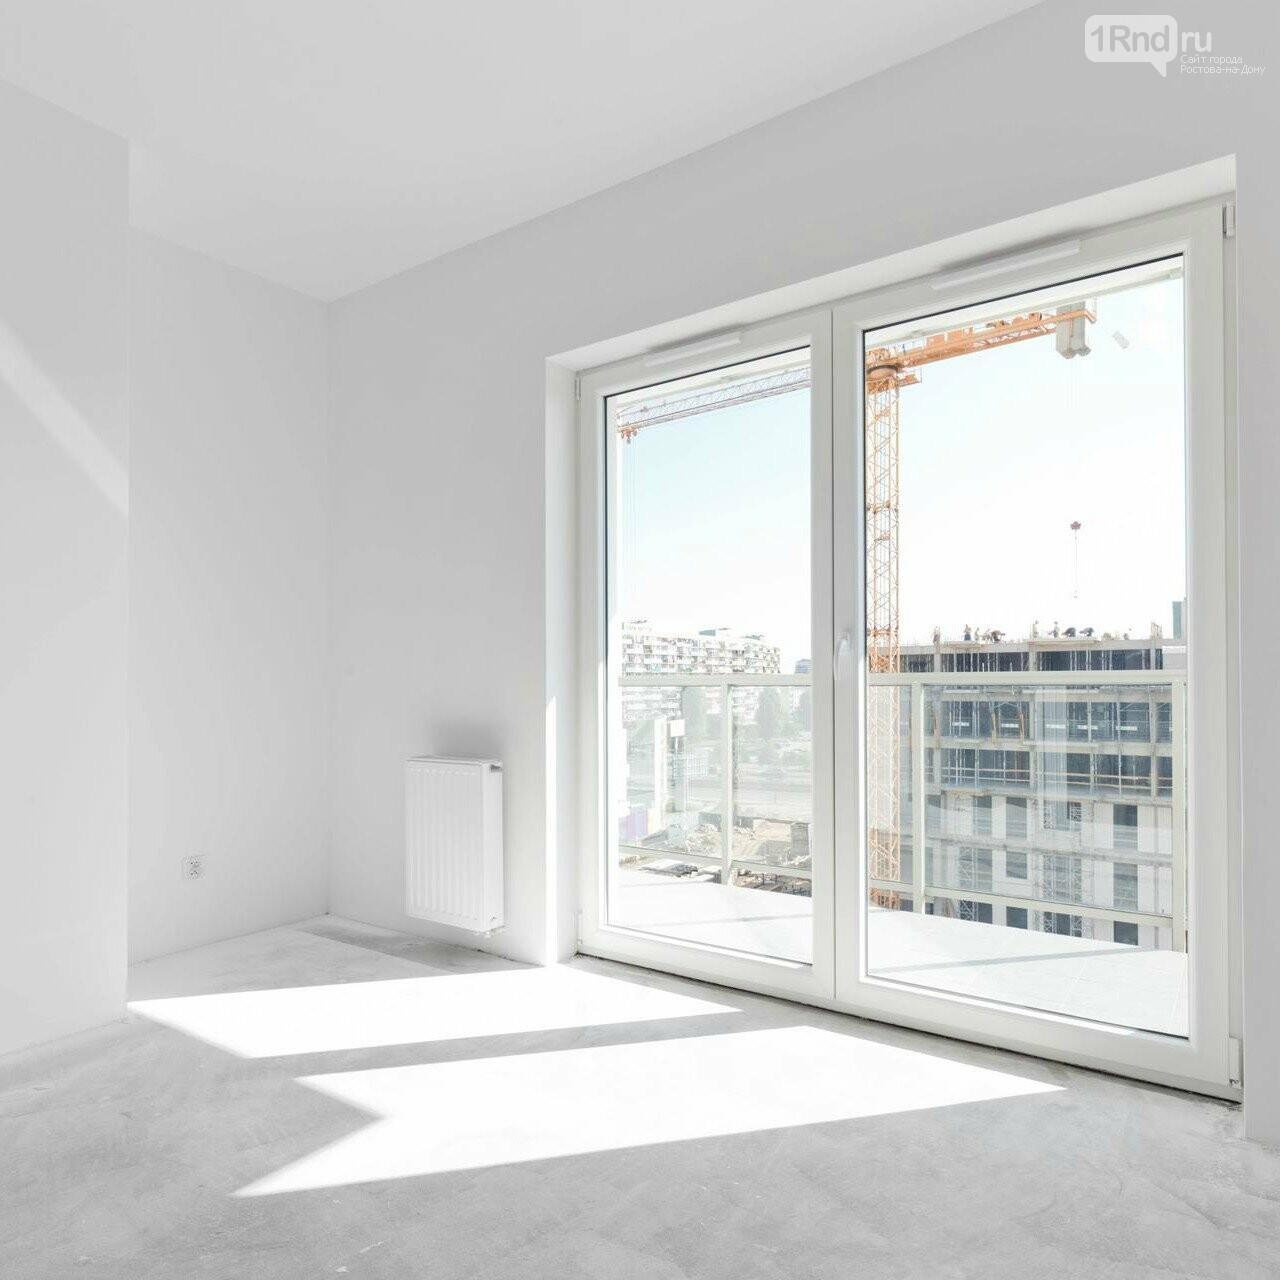 В Ростове в микрорайоне Левенцовка появились квартиры white box, фото-1